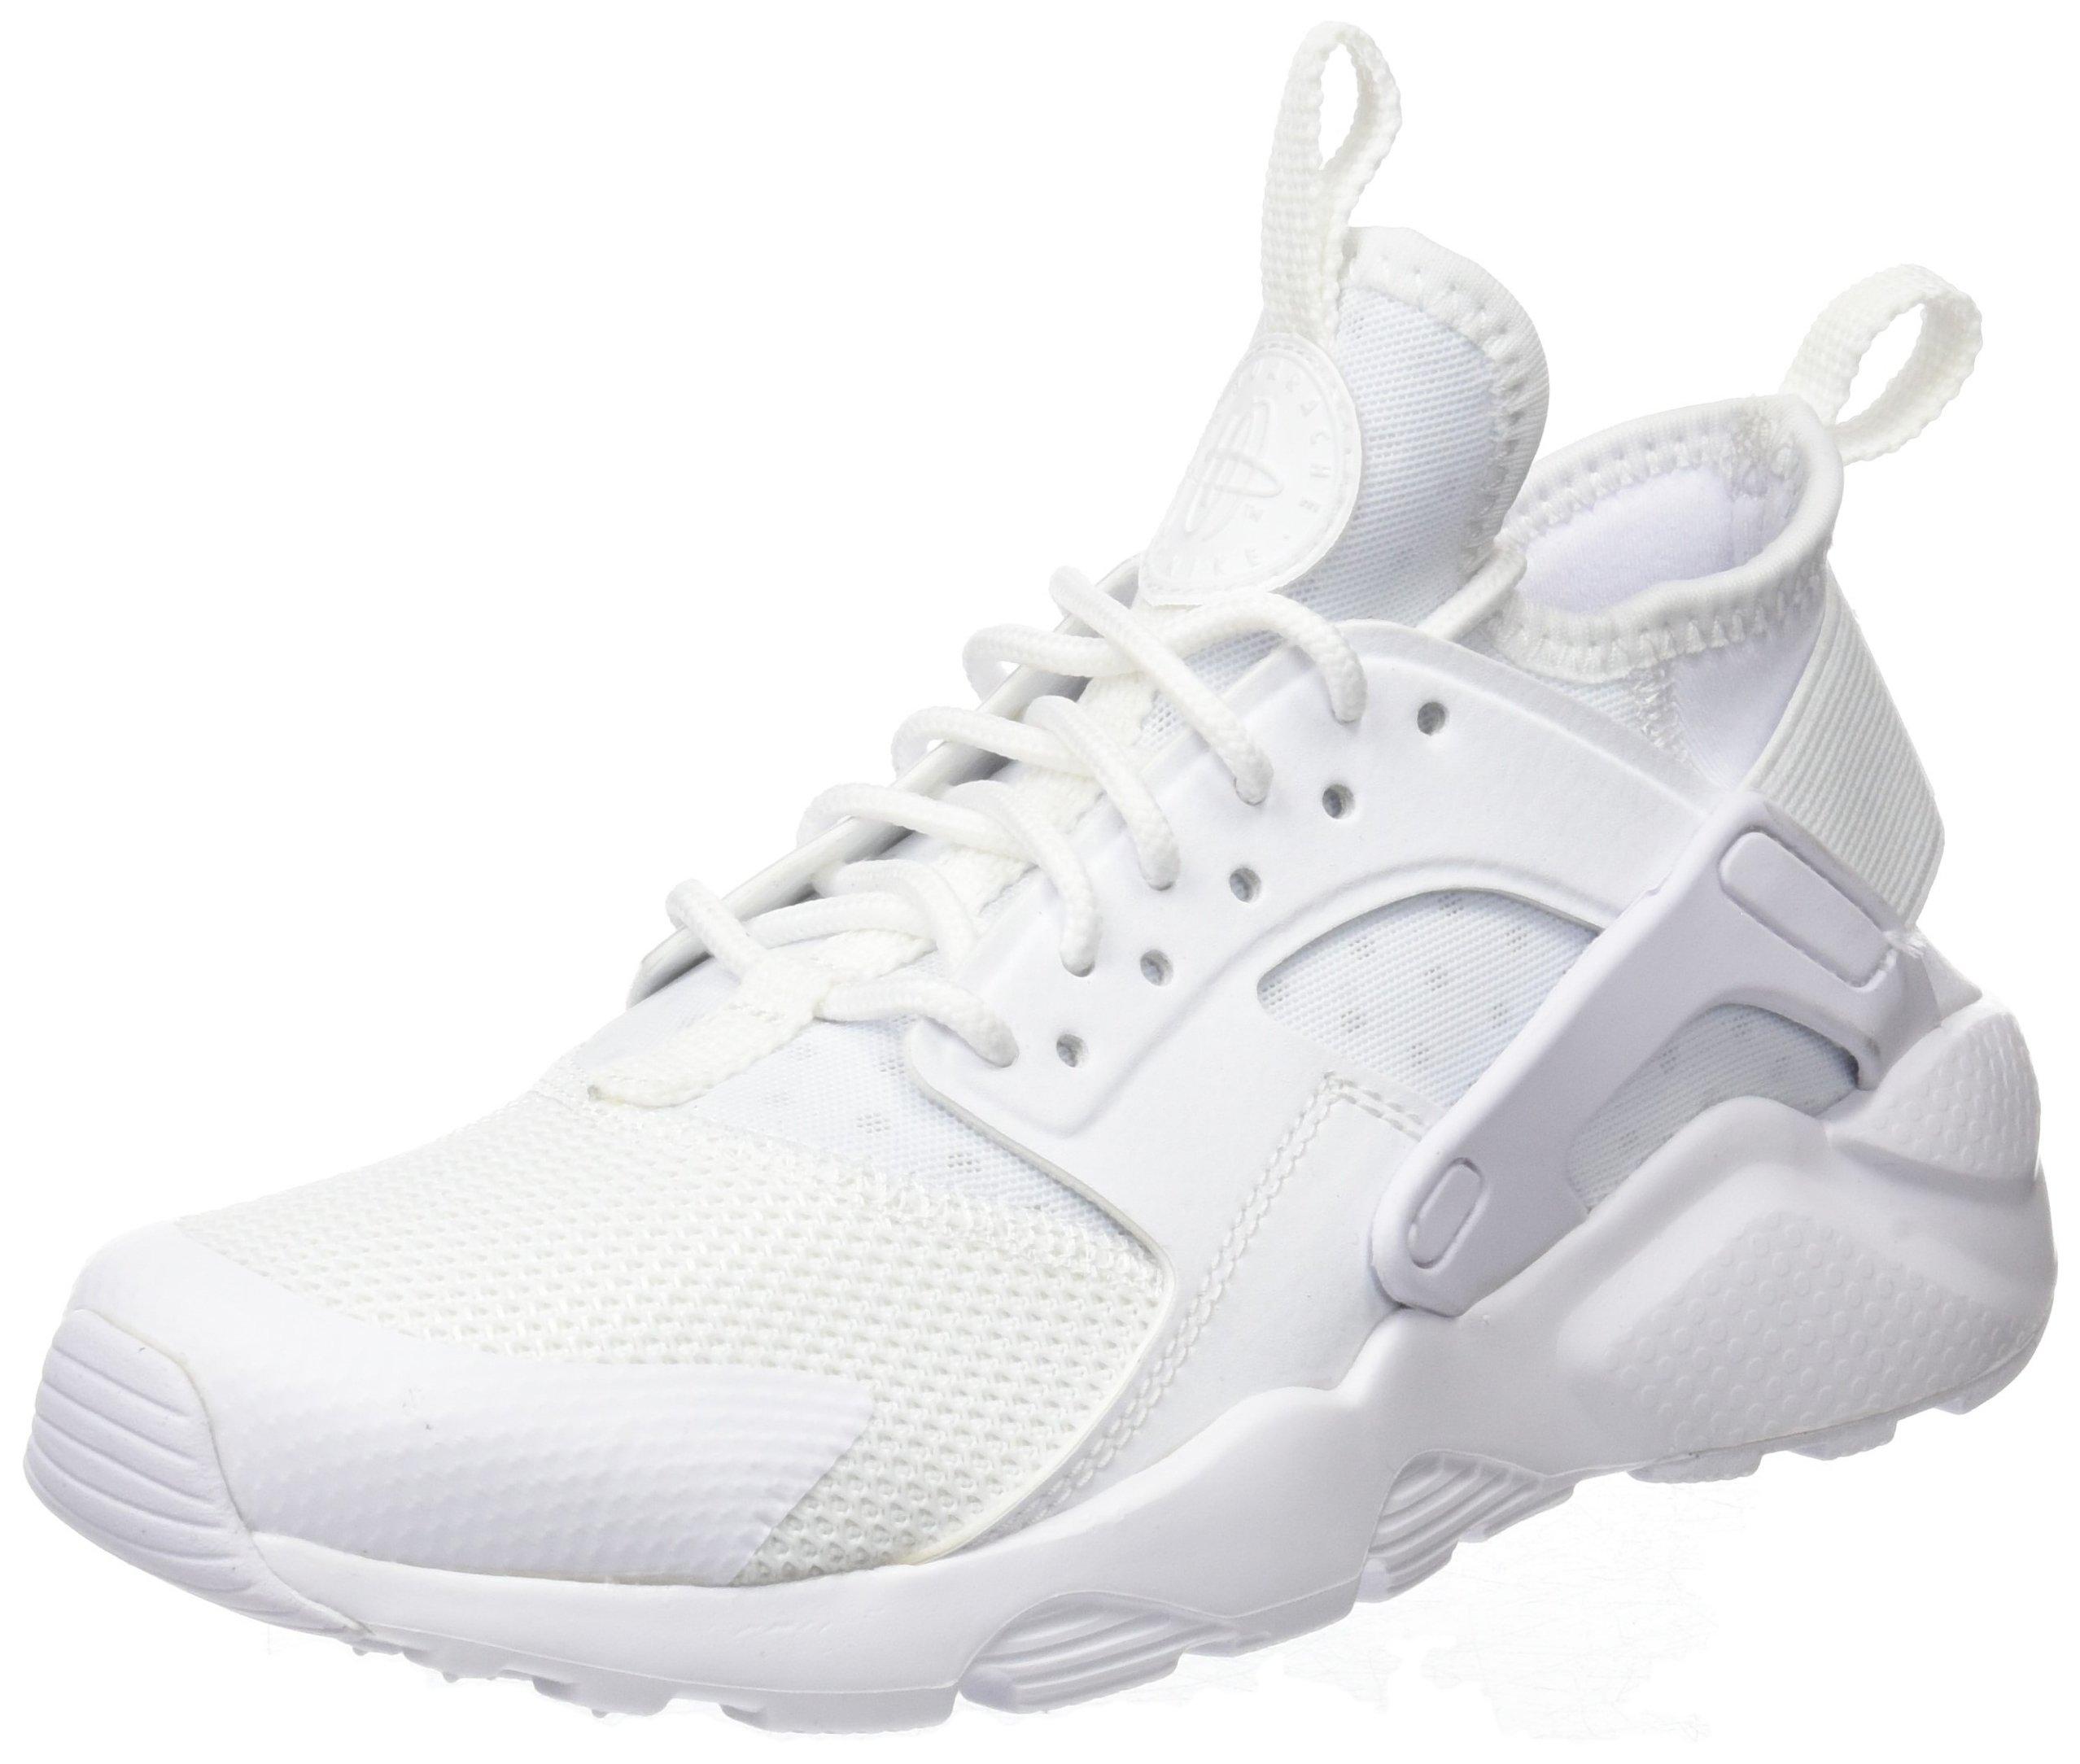 21eedbda2de4f Galleon - NIKE Air Huarache Run Ultra Big Kids  Running Shoes  White White White 847569-100 (6 M US)